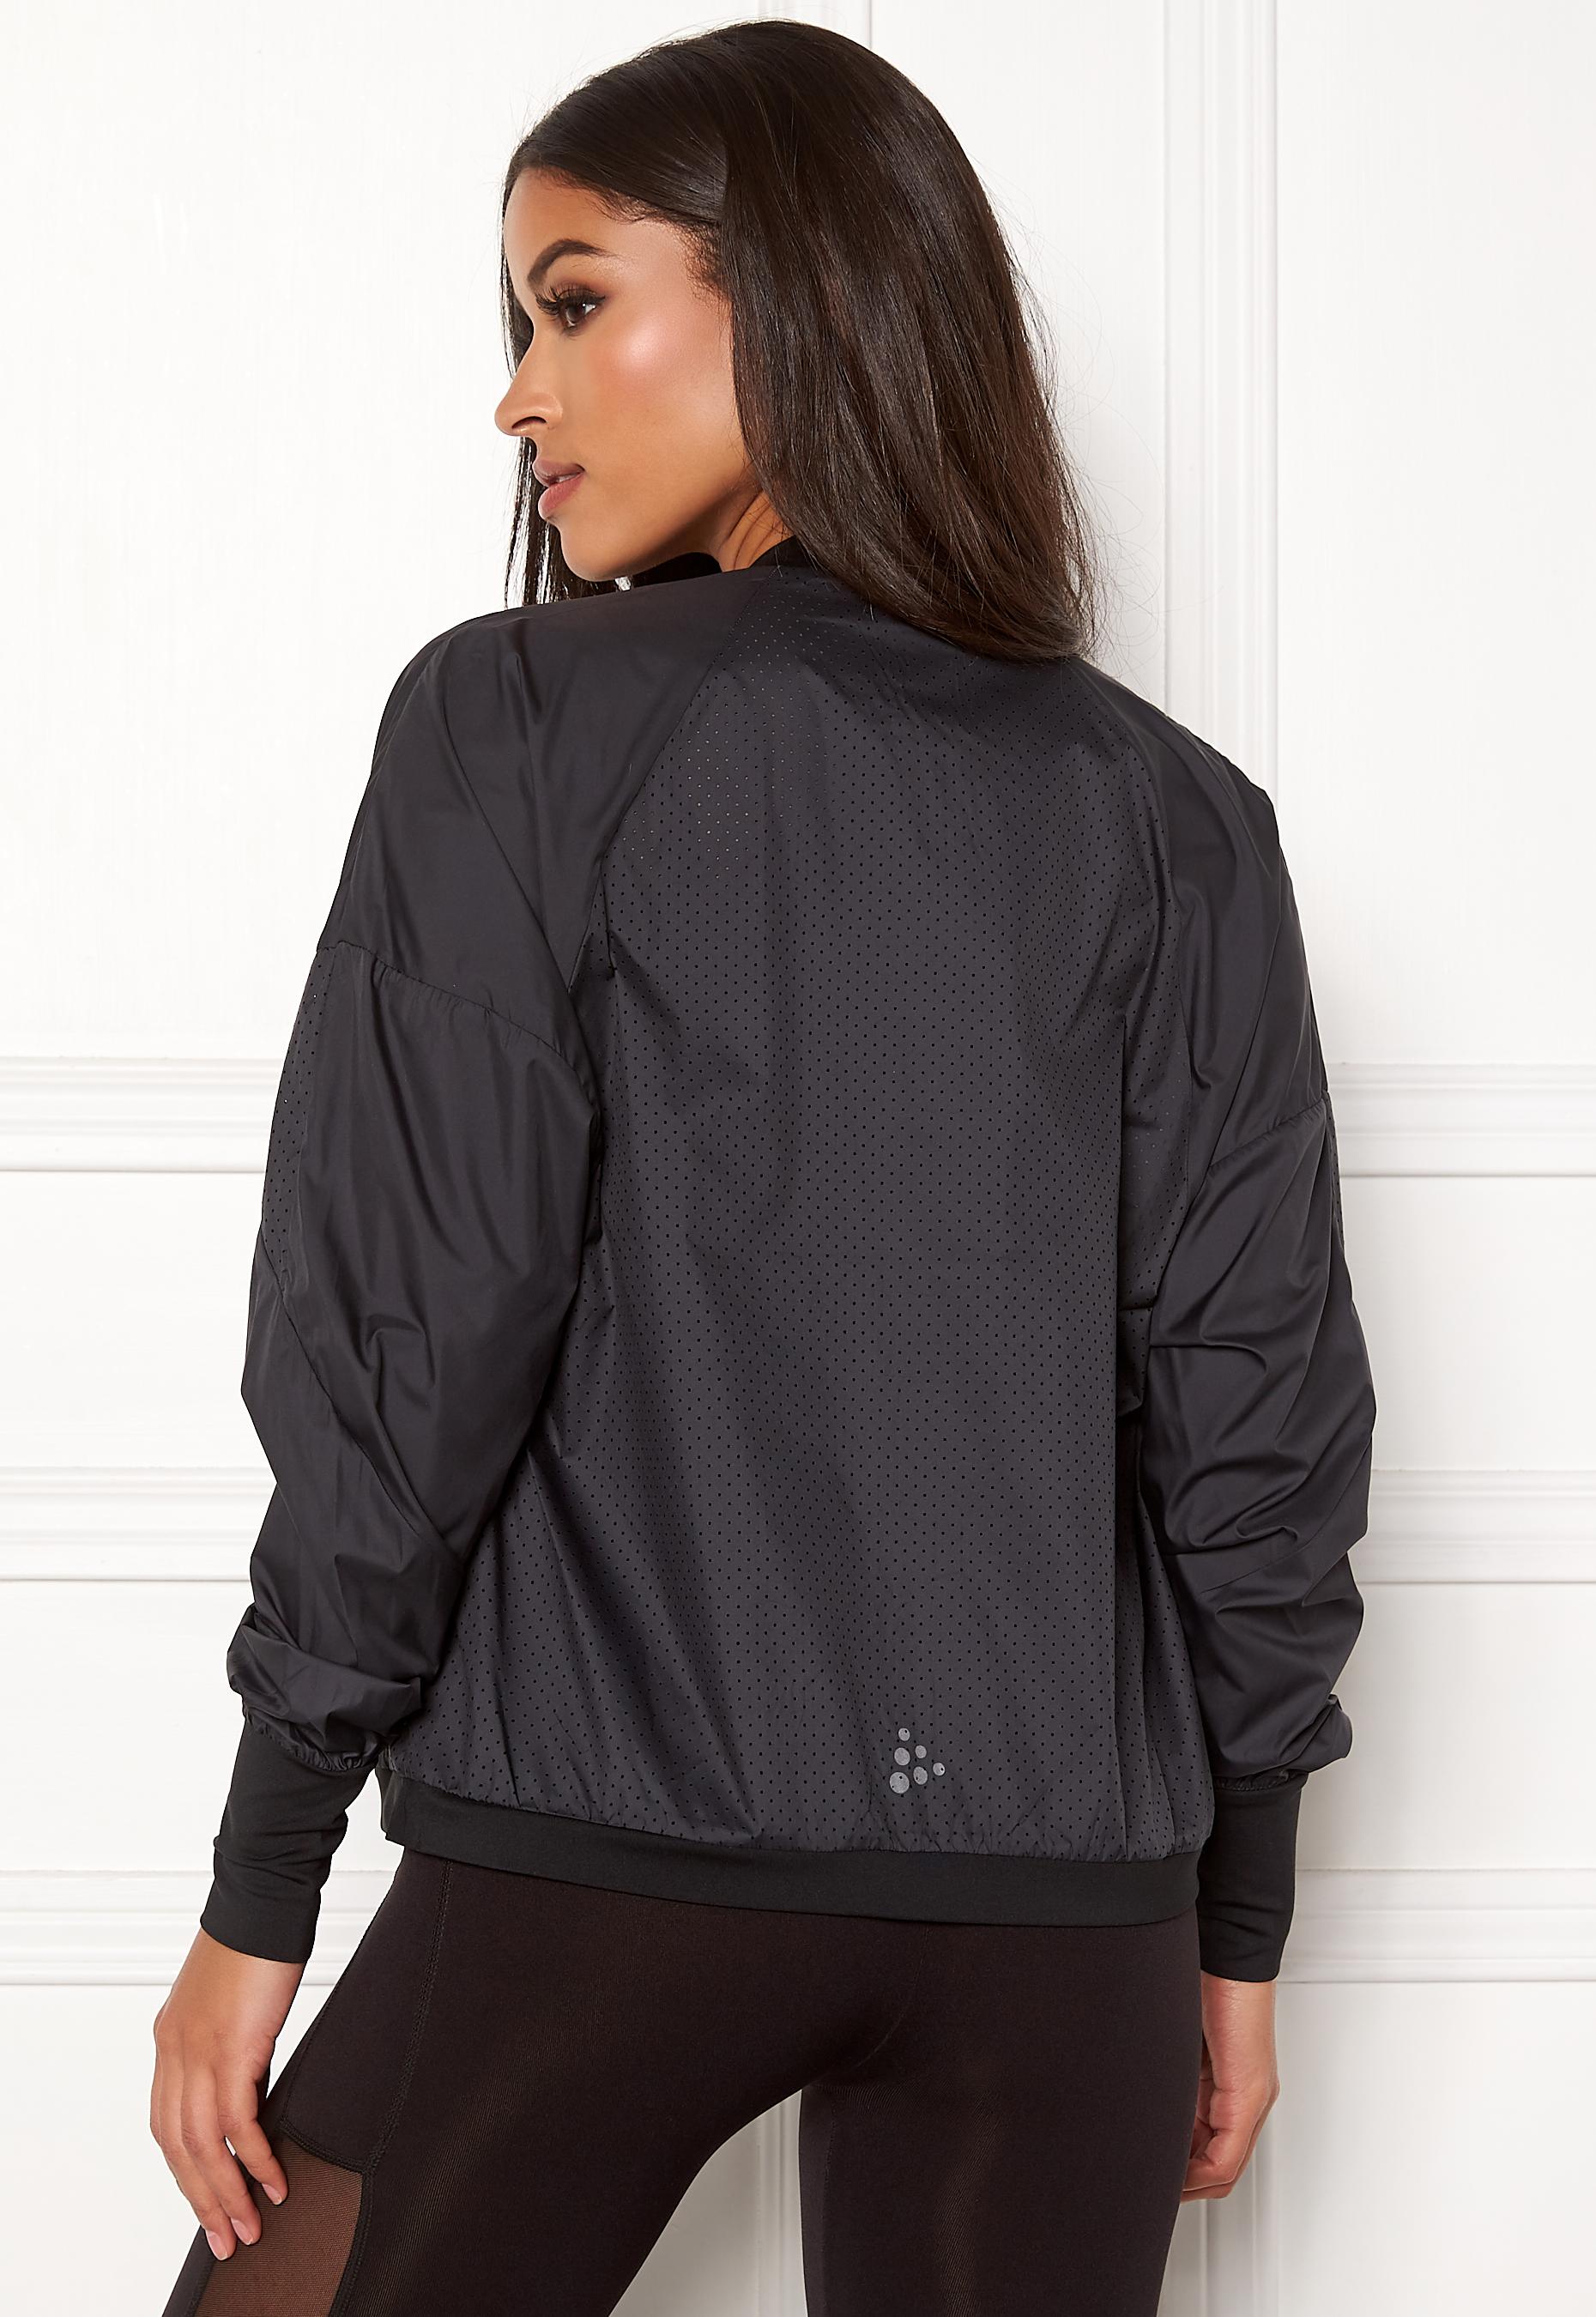 e5ffe43f Craft Charge Jacket Black - Bubbleroom